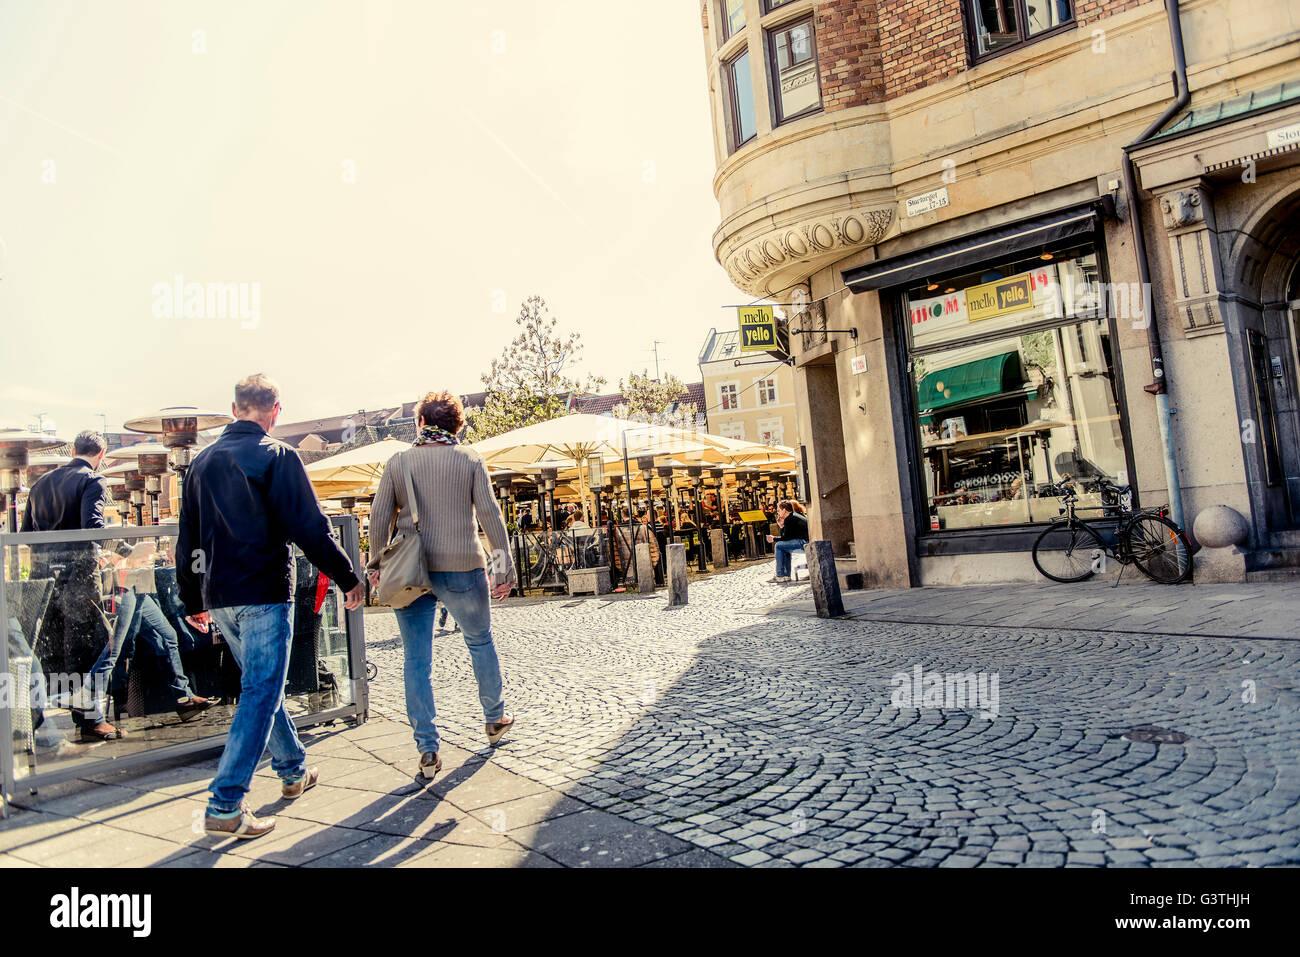 Suecia, Skane, Malmo, Lilla Torg, Senior par la celebración handsi n Town Square Imagen De Stock